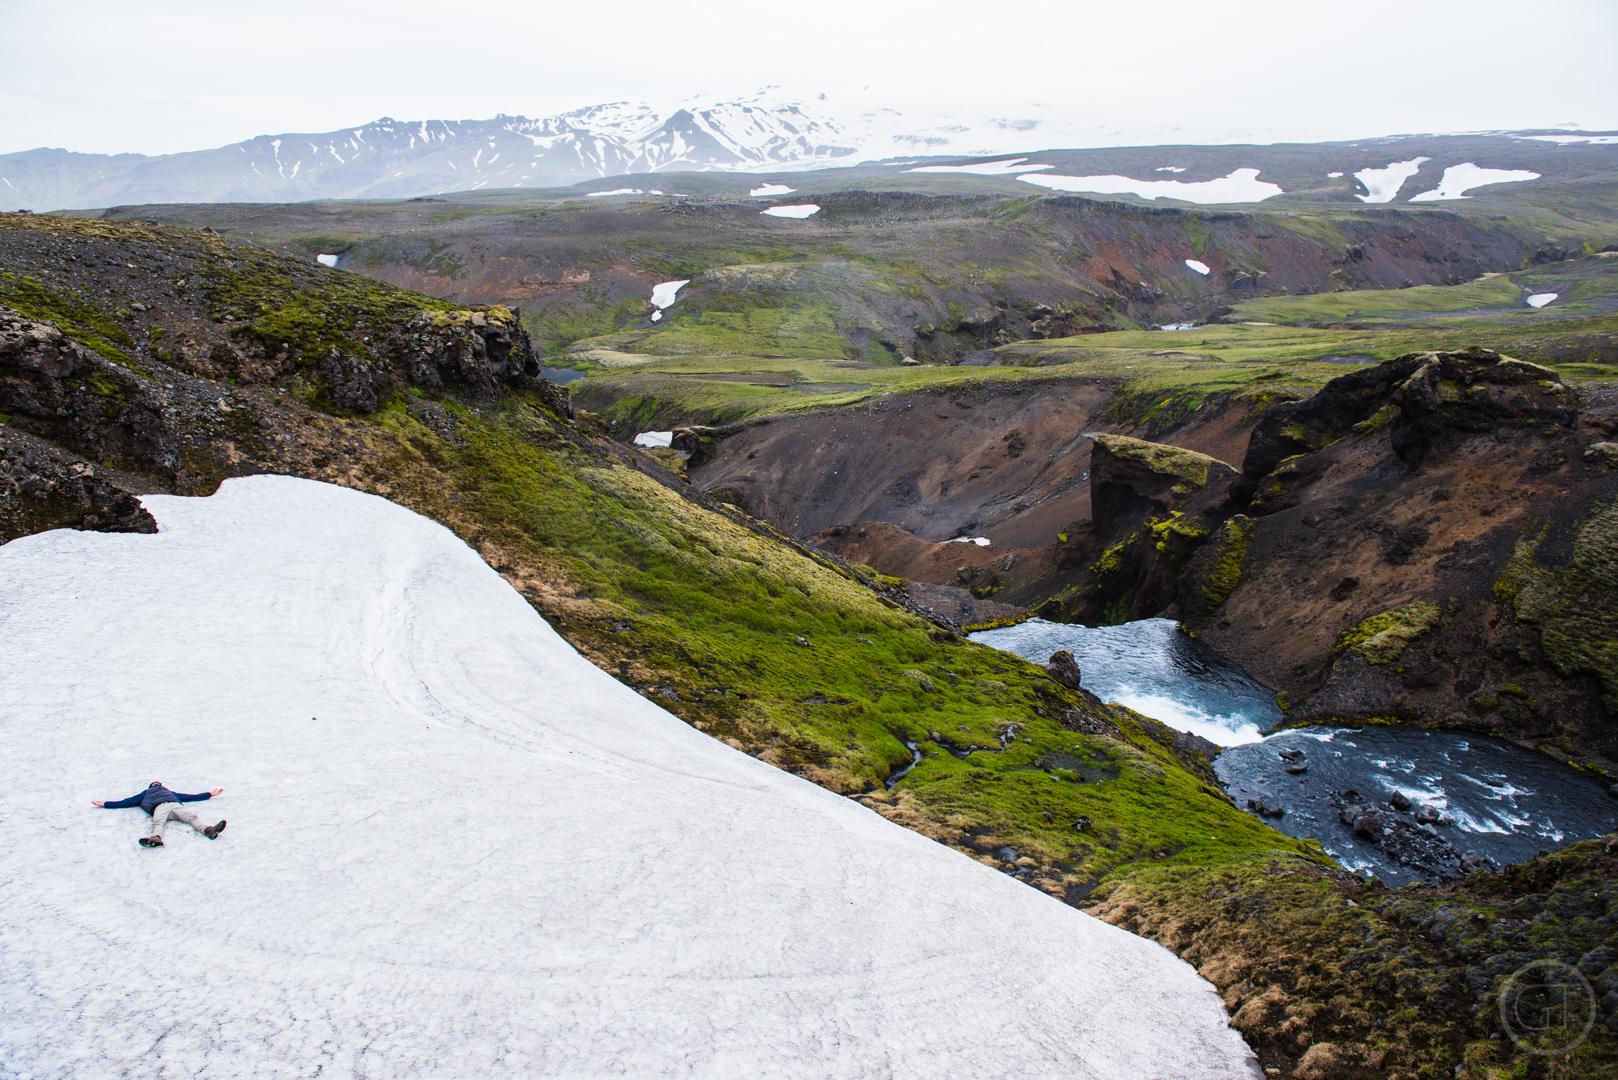 Iceland-gustav-thuesen-photography-landscape-nature-københavn-danmark-adventure-outdoor-lifestyle-26.jpg